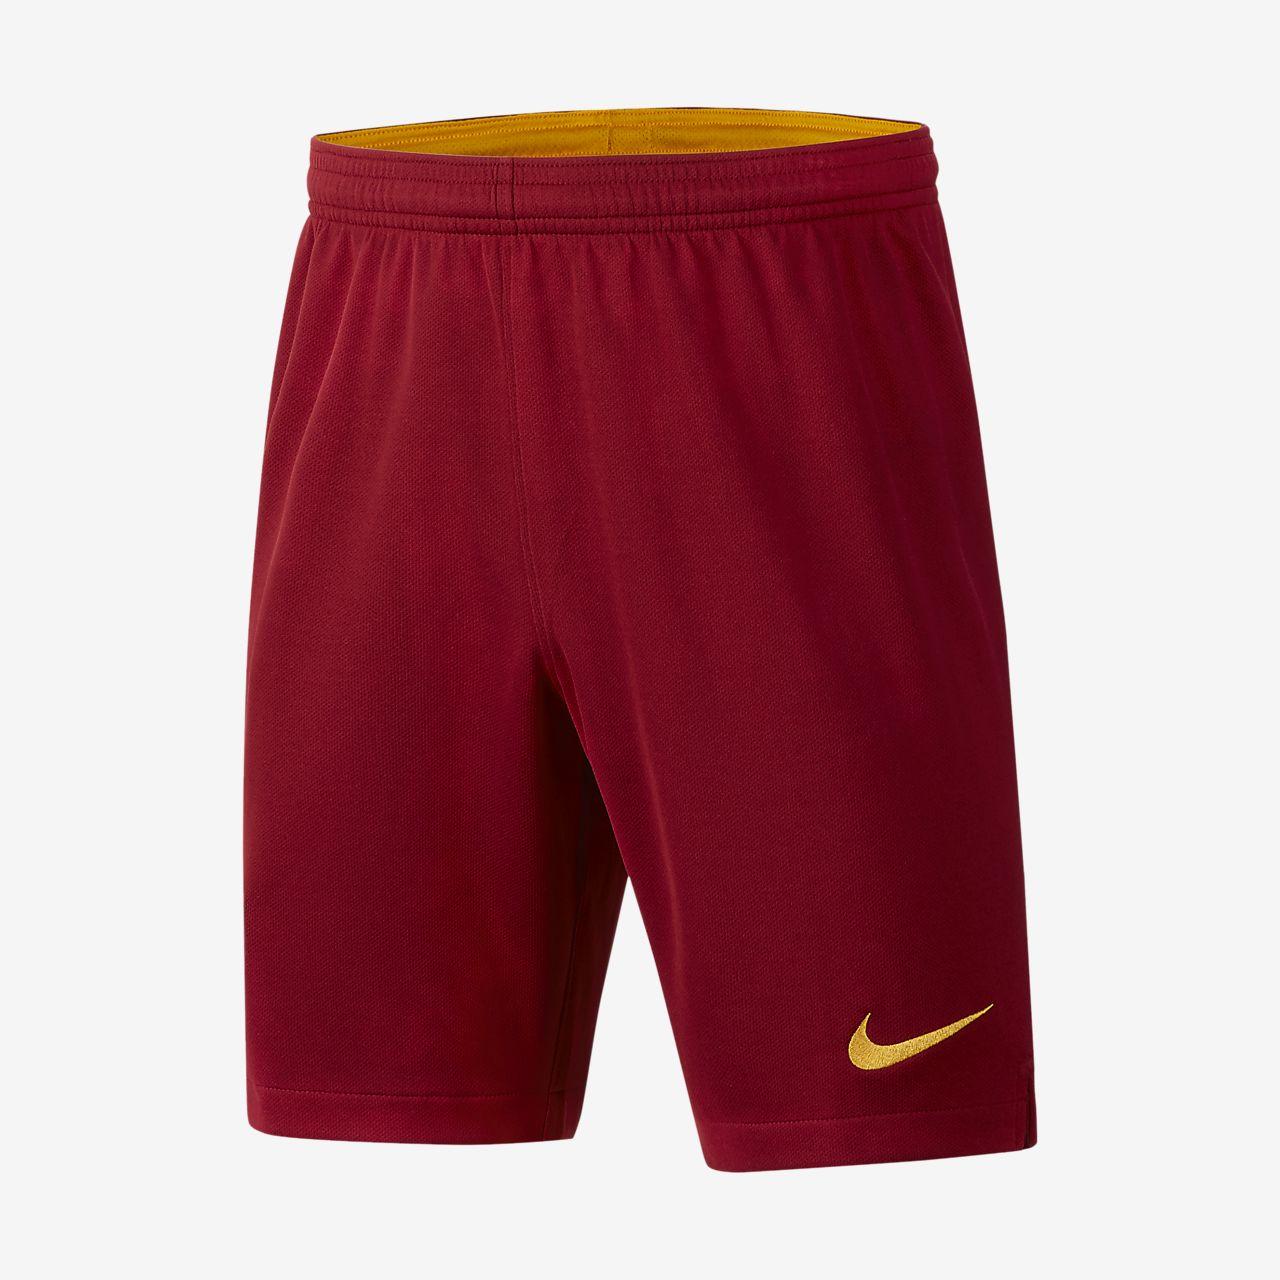 A.S. Roma 2019/20 Stadium Home/Away Pantalons curts de futbol - Nen/a